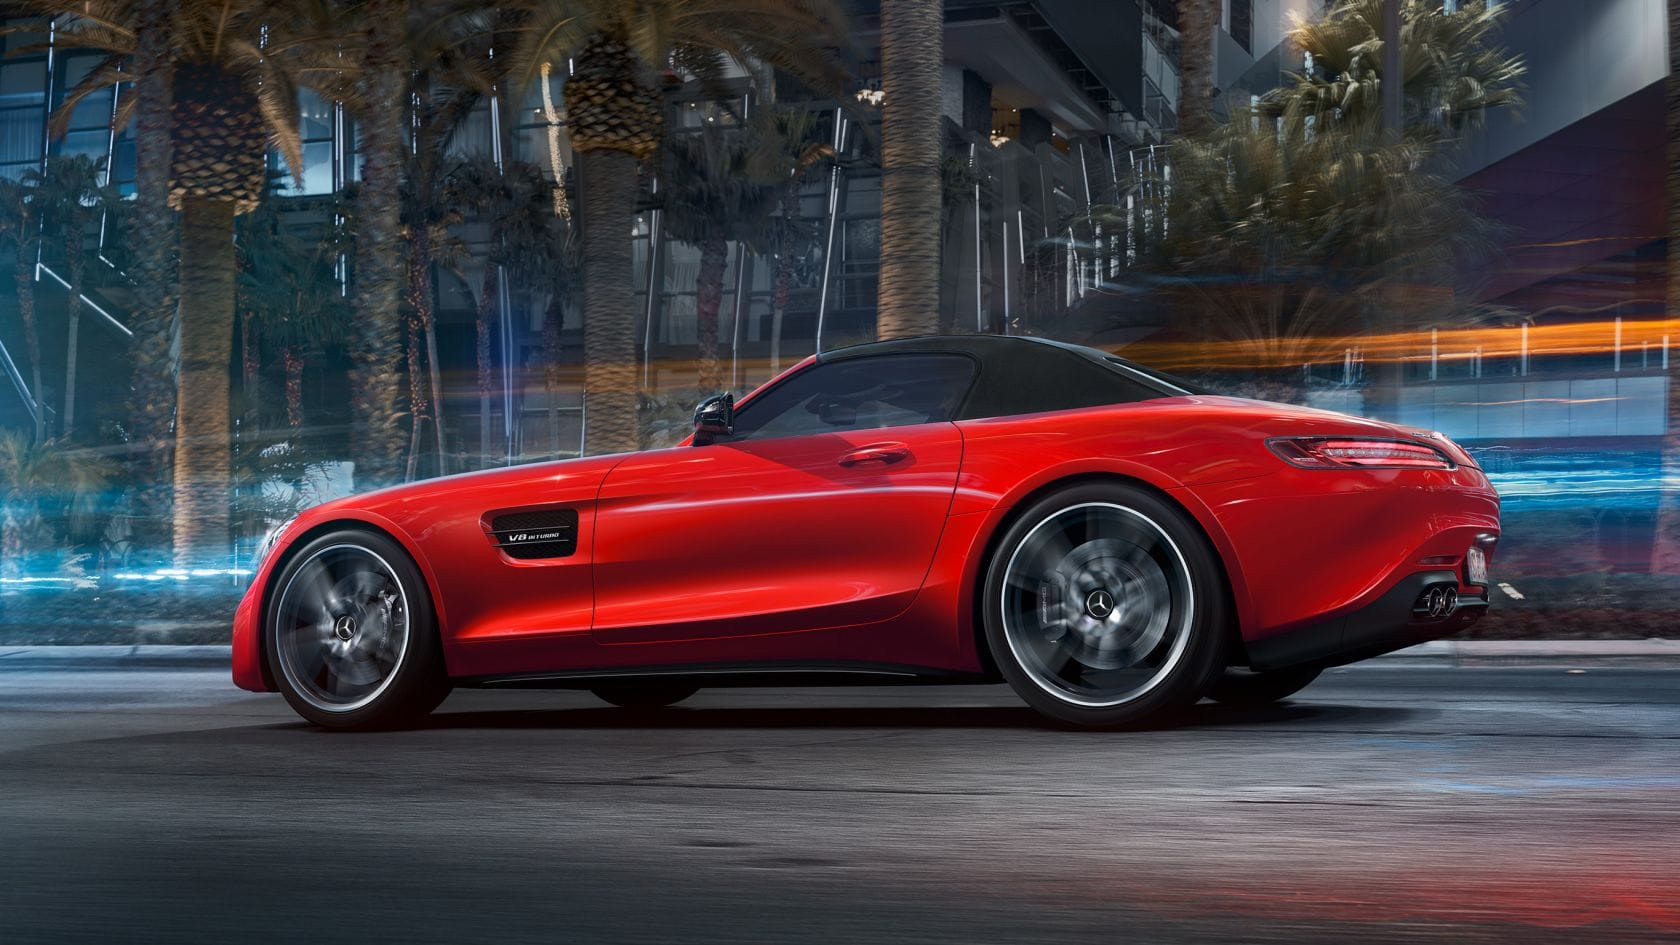 AMG-GT-Roadster-Seitenansicht-dynamisch-rot-geschlossen-Stoffverdeck